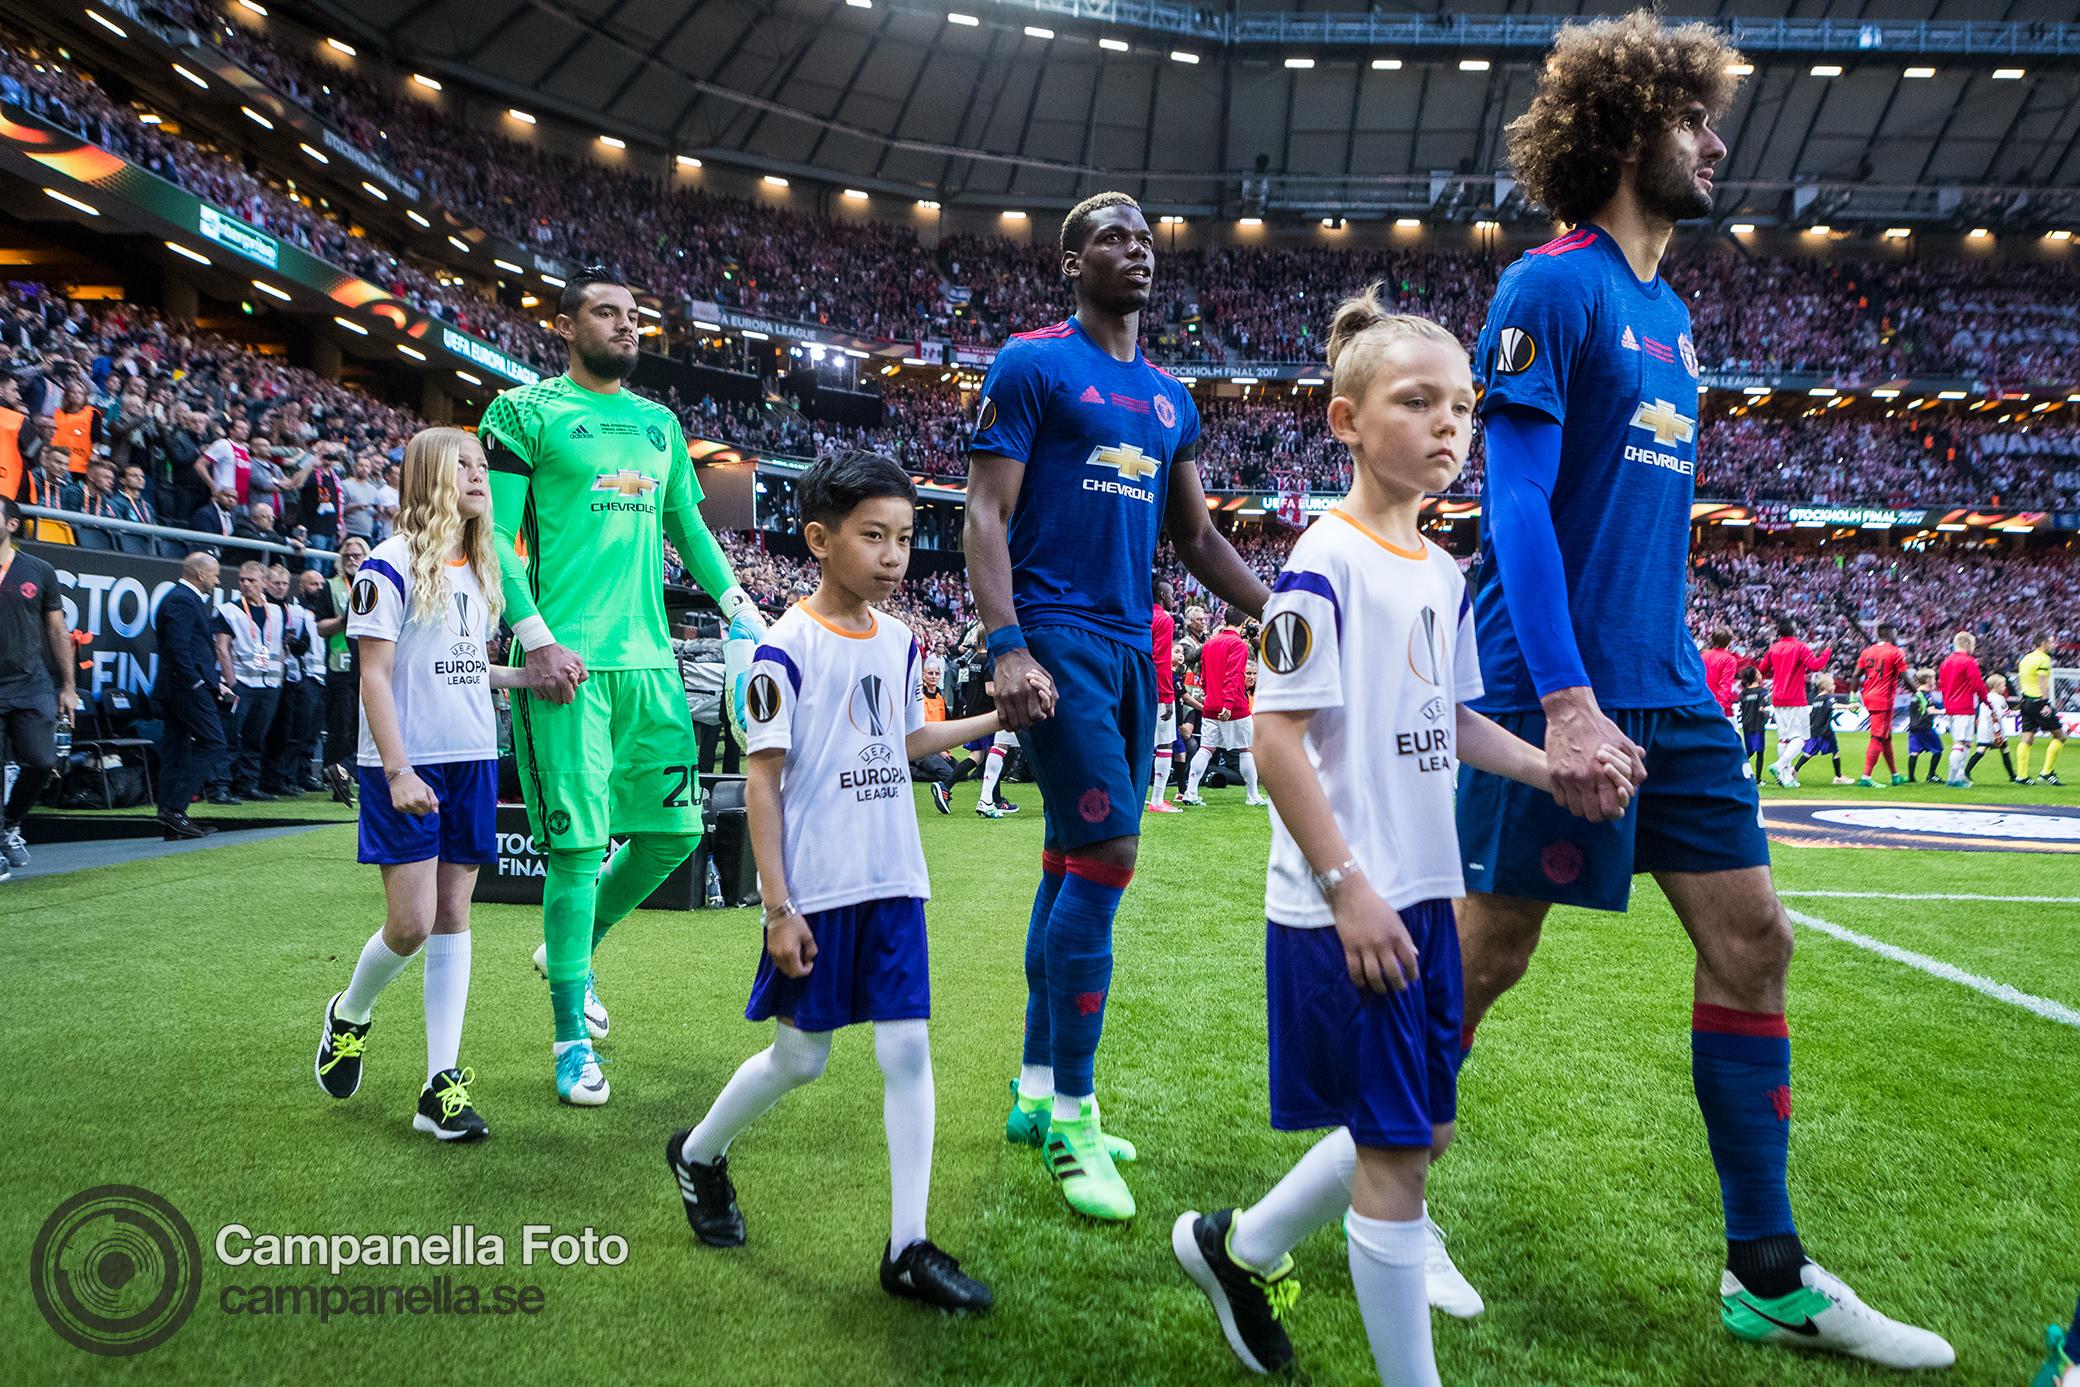 Europa League Final comes to Stockholm - Michael Campanella Photography